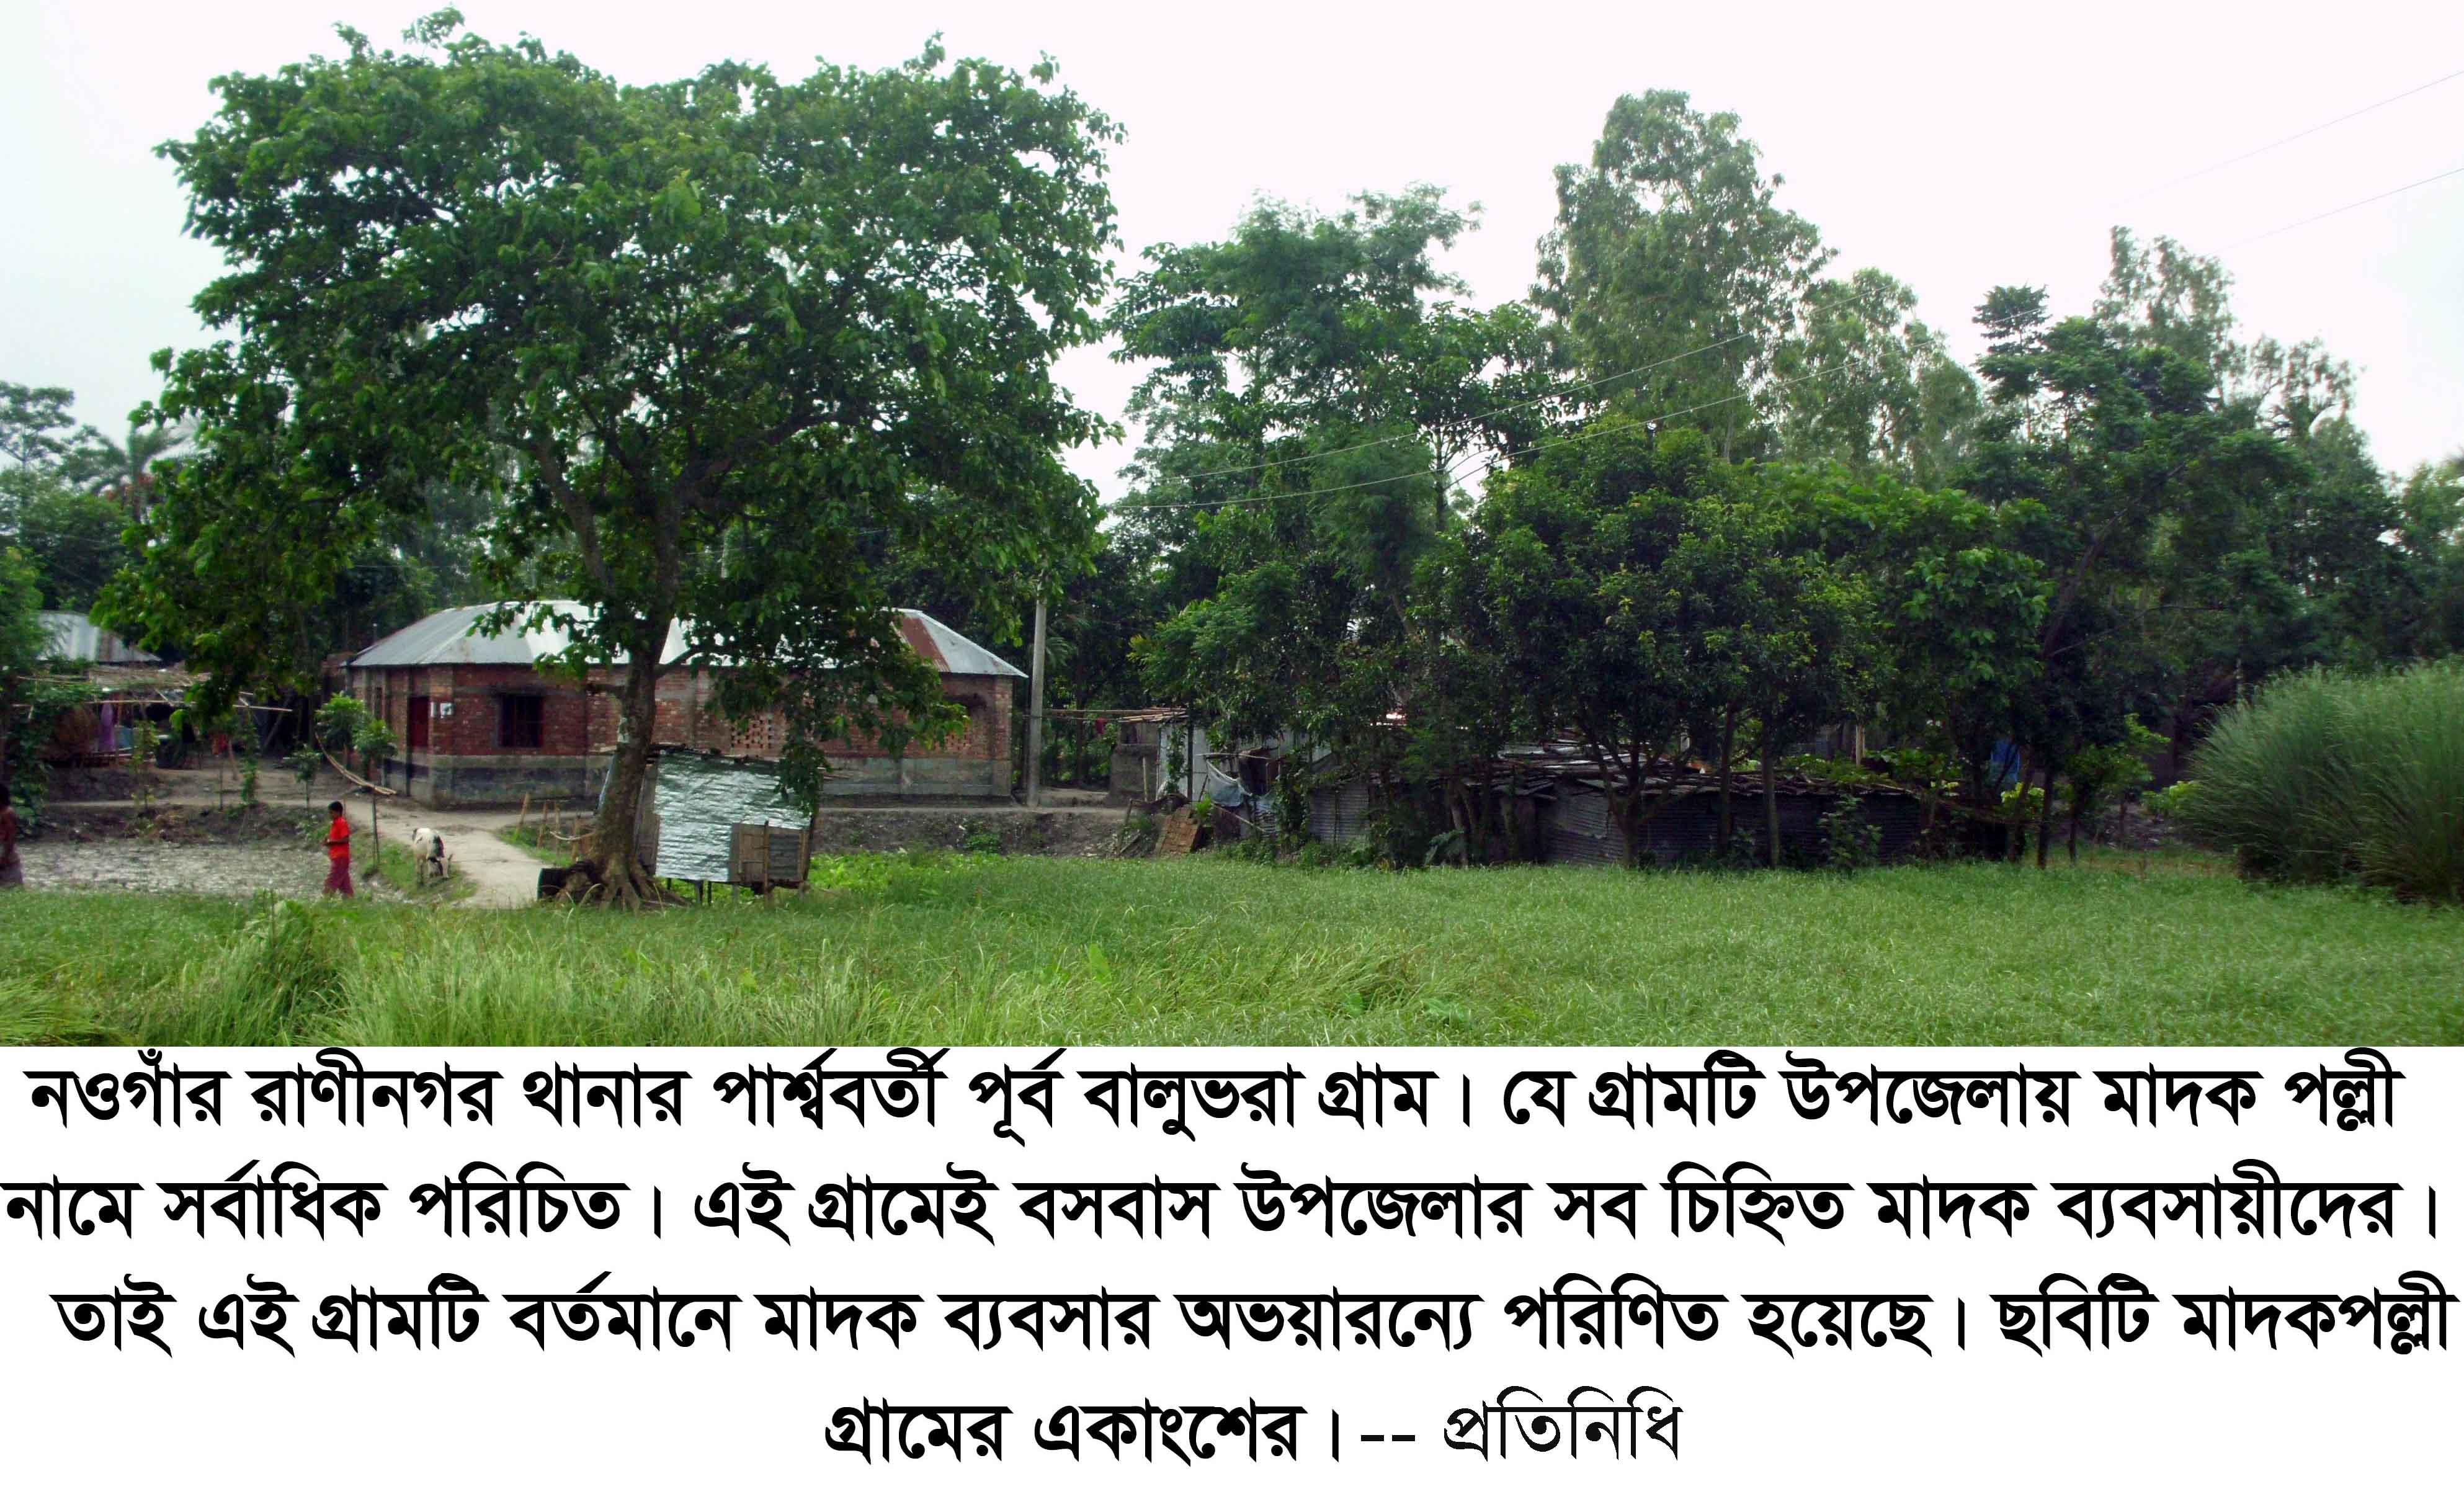 Picture Raninagar Madok Polli 03.07.15